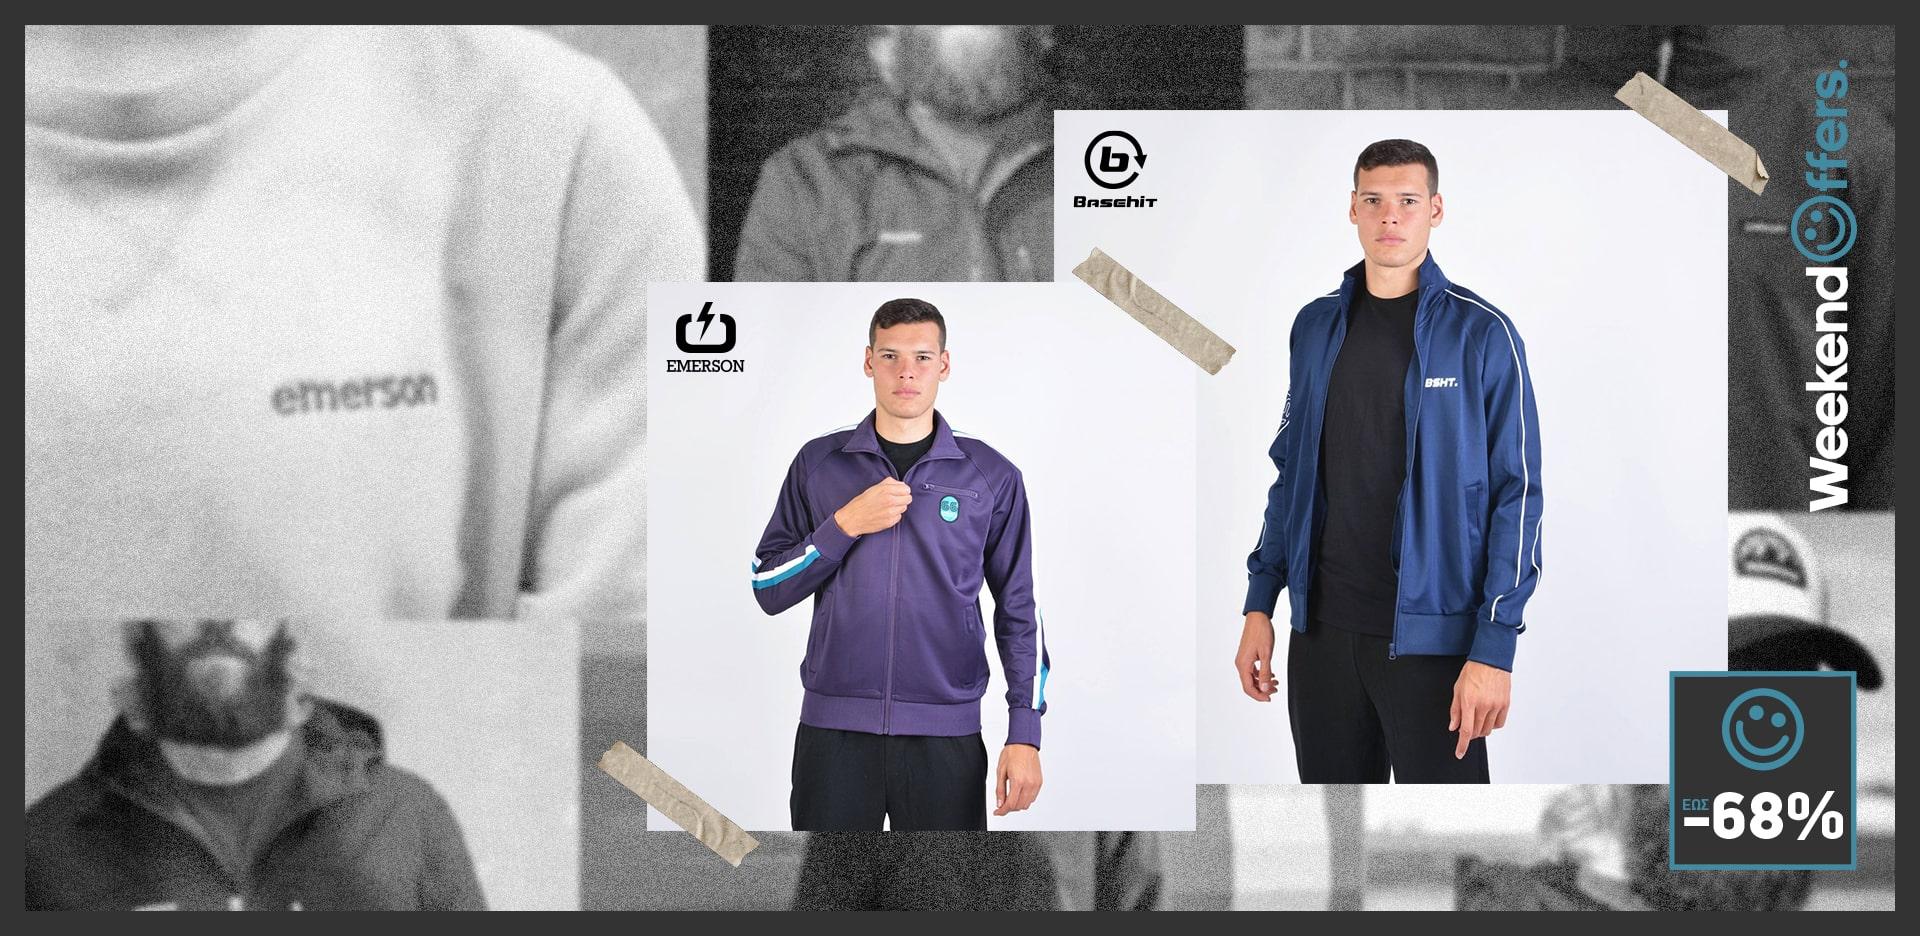 emerson basehit track jackets